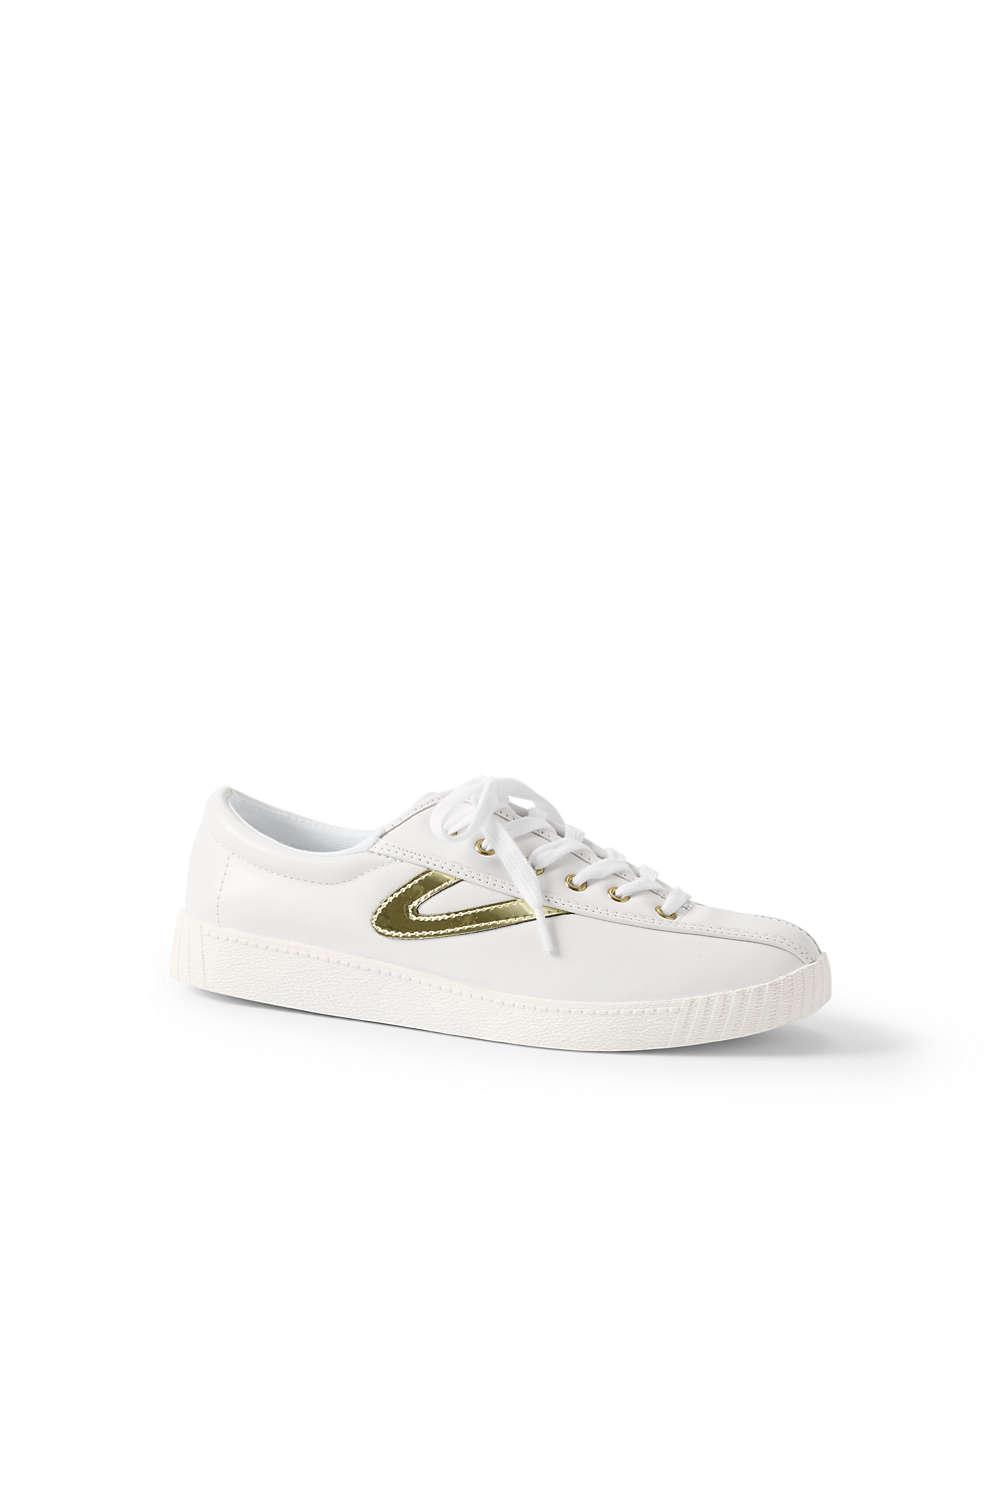 brand new 2b181 0f7bf Women s Tretorn Nylite2 Plus Sneakers